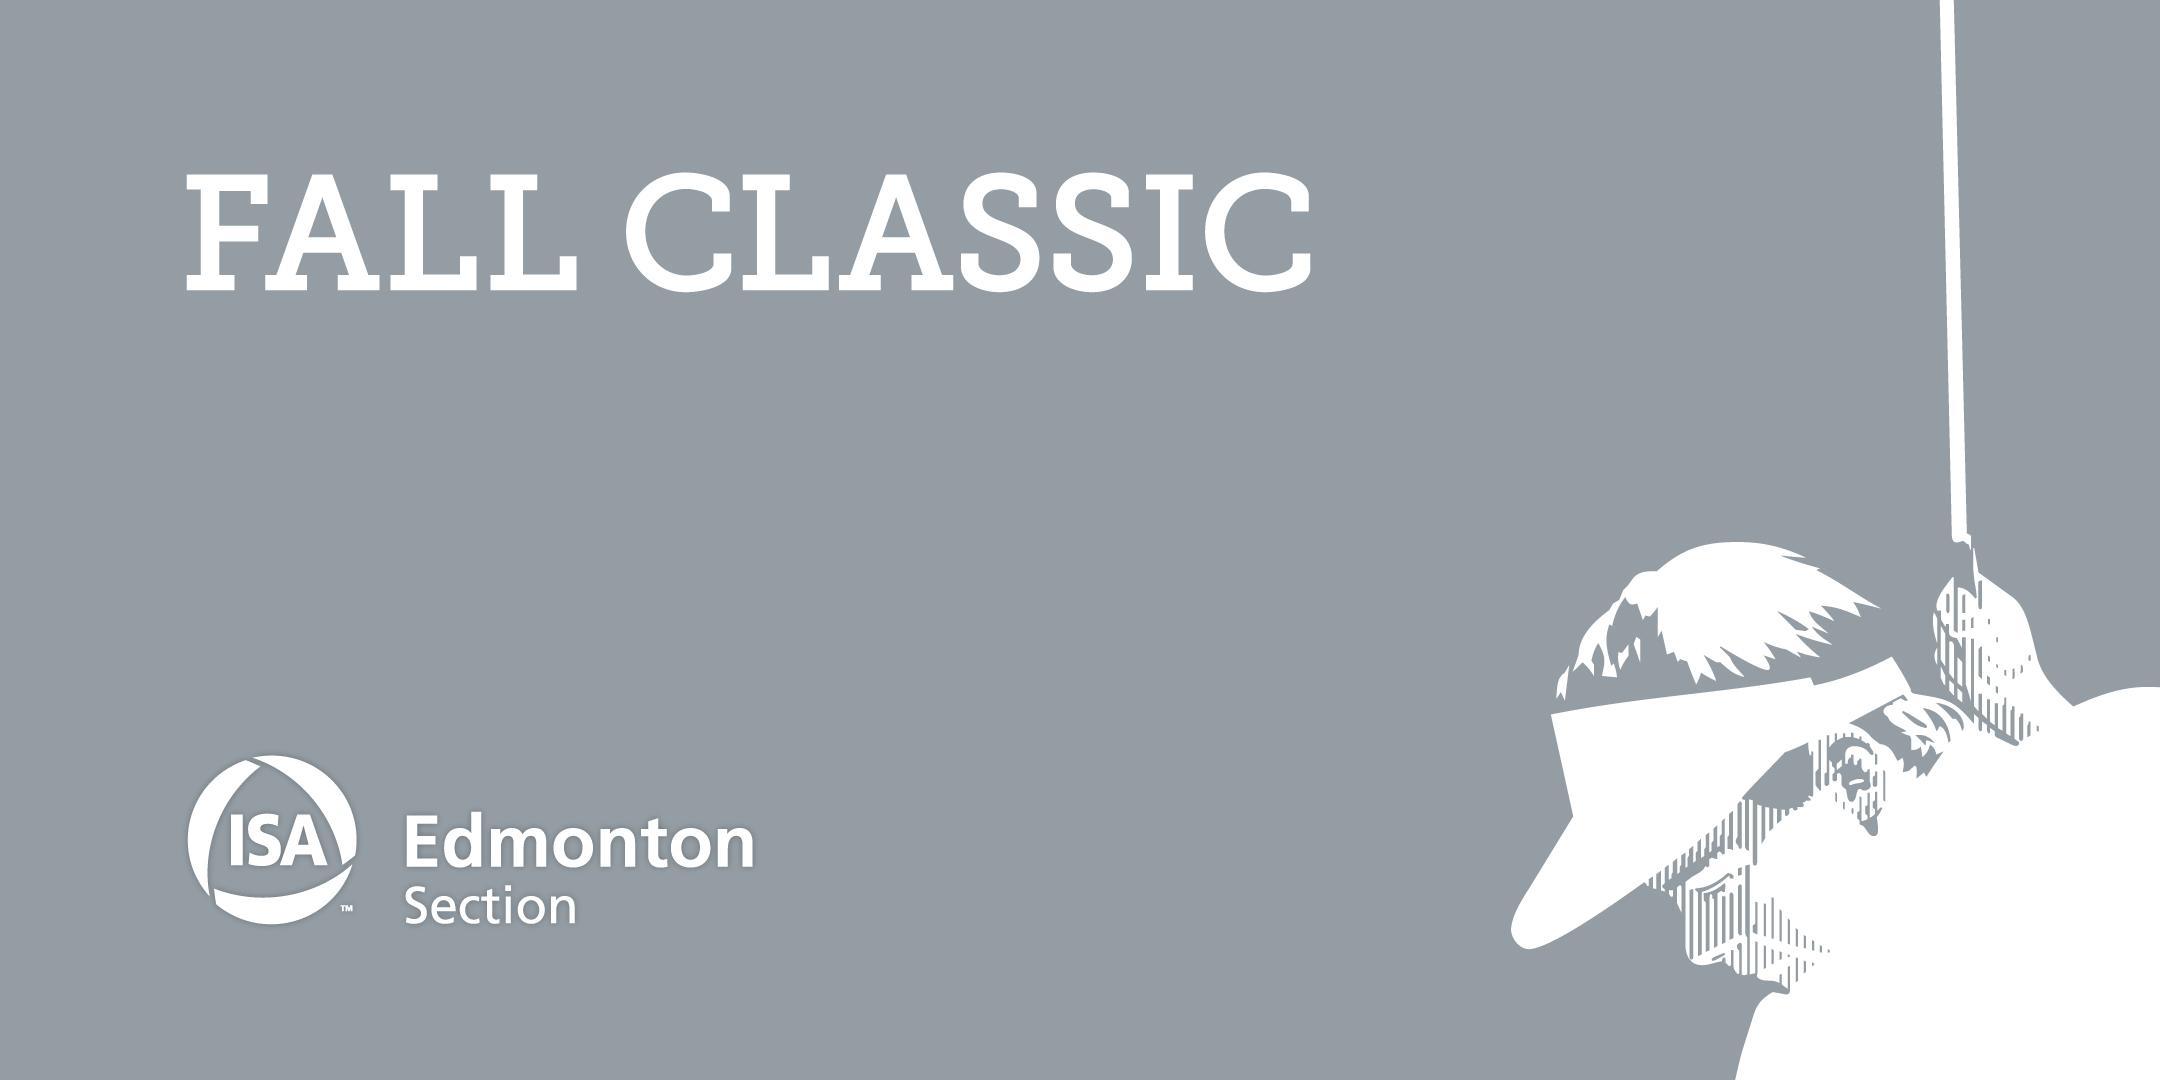 2021 Fall Classic Golf Tournament